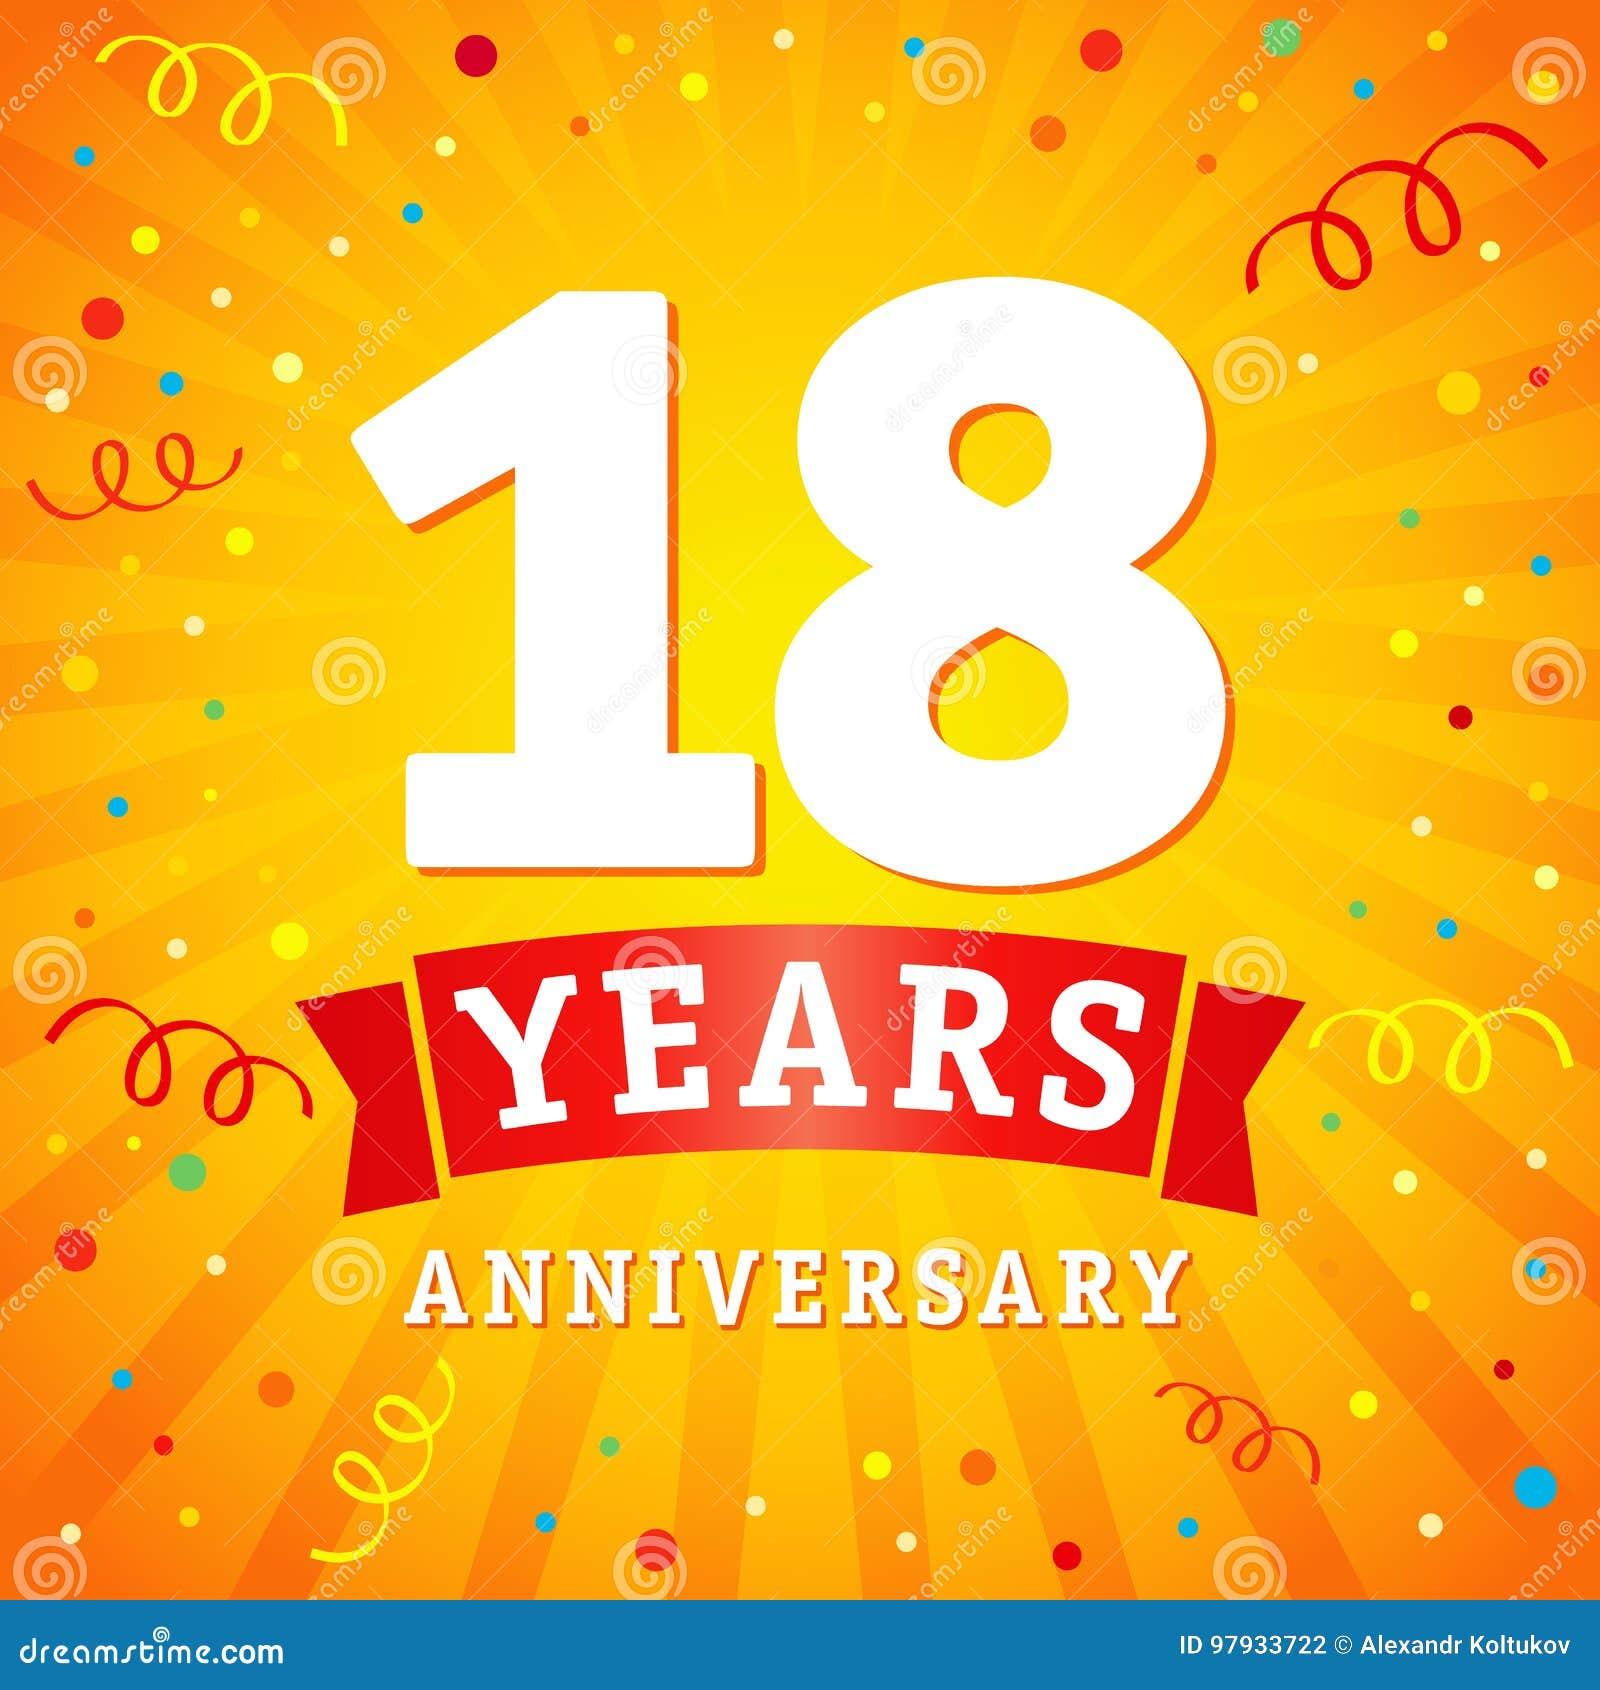 18 years anniversary logo celebration card stock vector